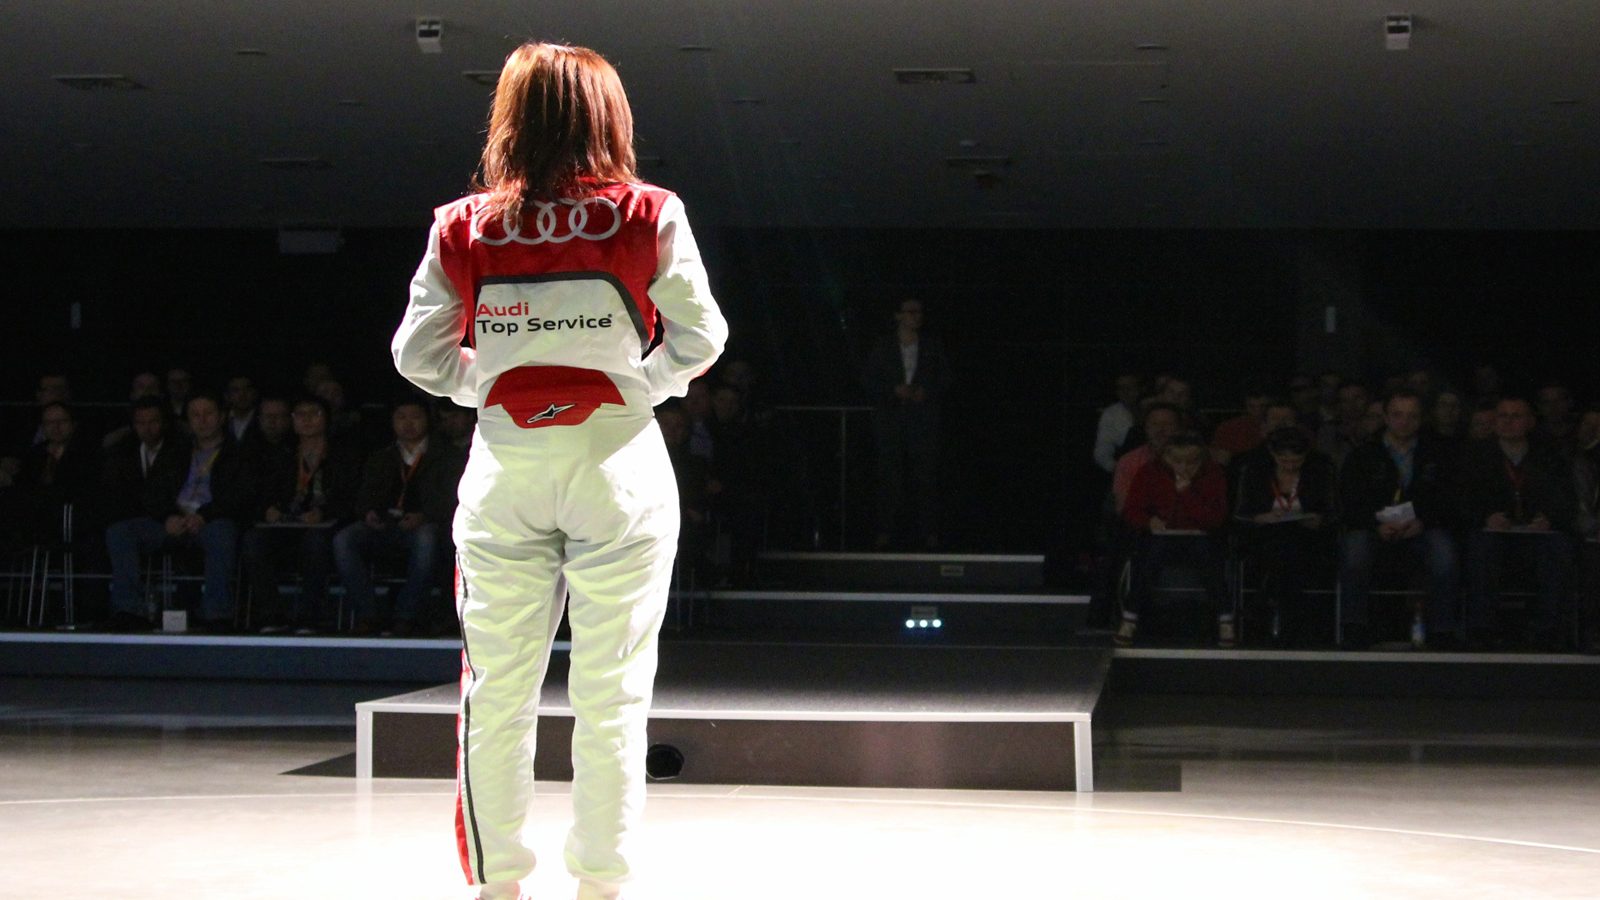 Audi Moderatorin München